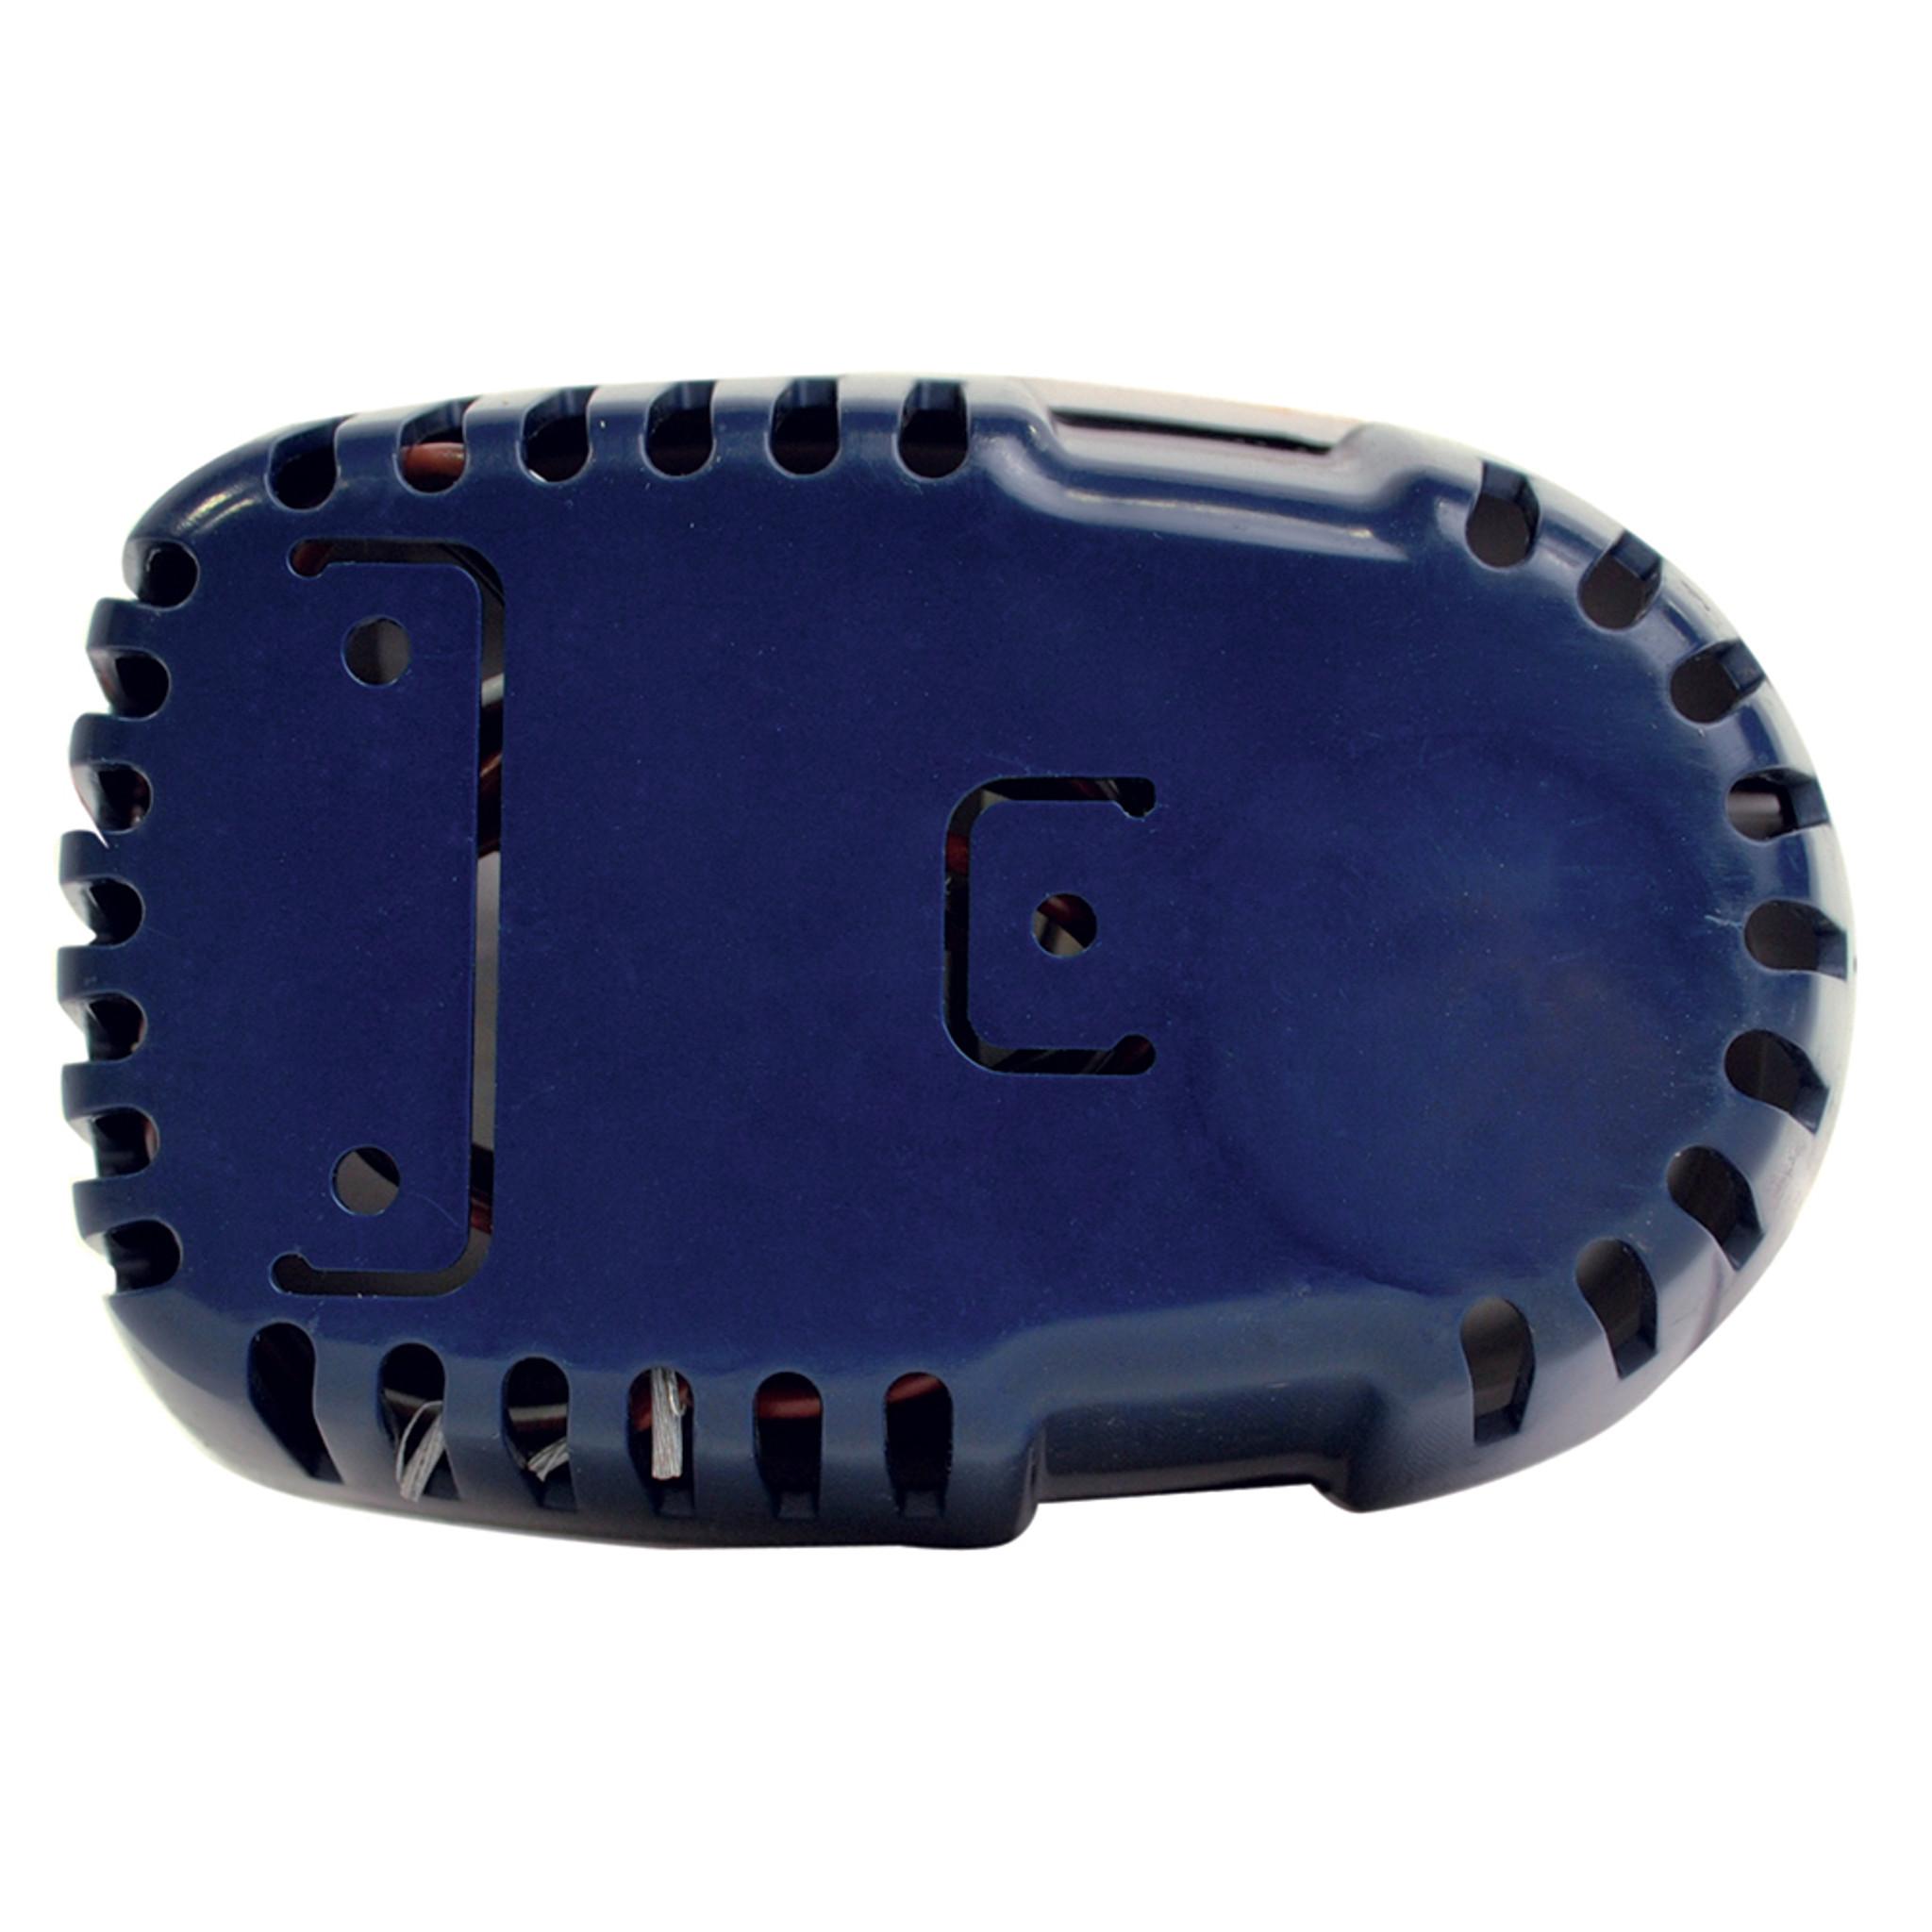 4201-7 attwood Auto Bilge pump Float Switch 12 amp 12V 24V 3 YEARS WARRANTY